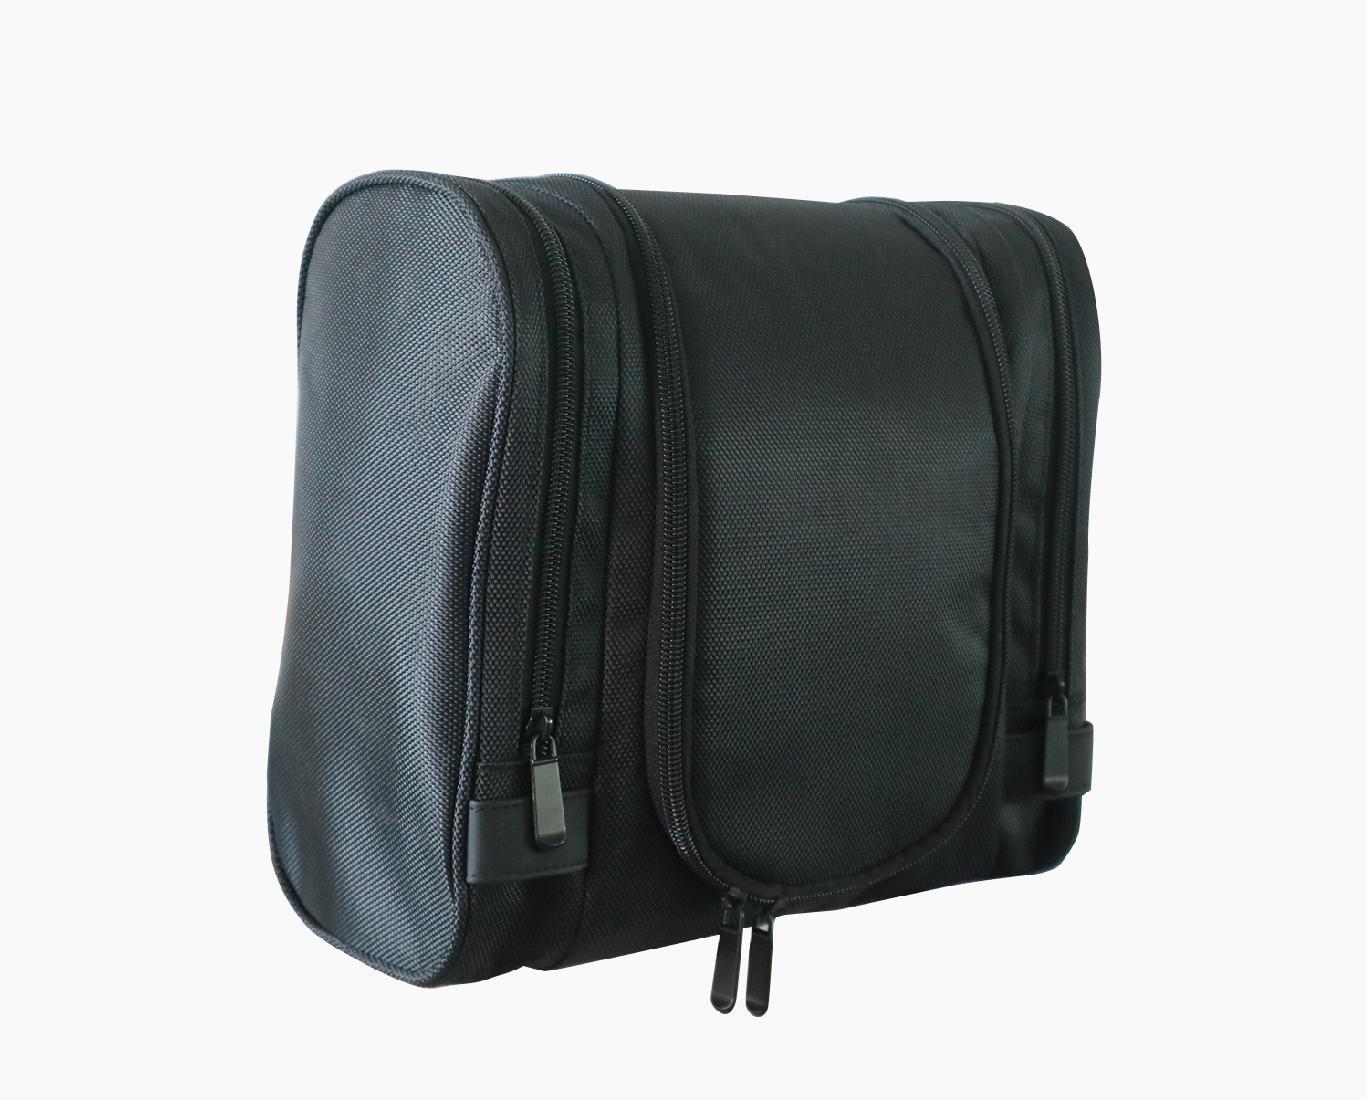 1680D polyester black multifunction men high grade travel hanging toiletry bag  3